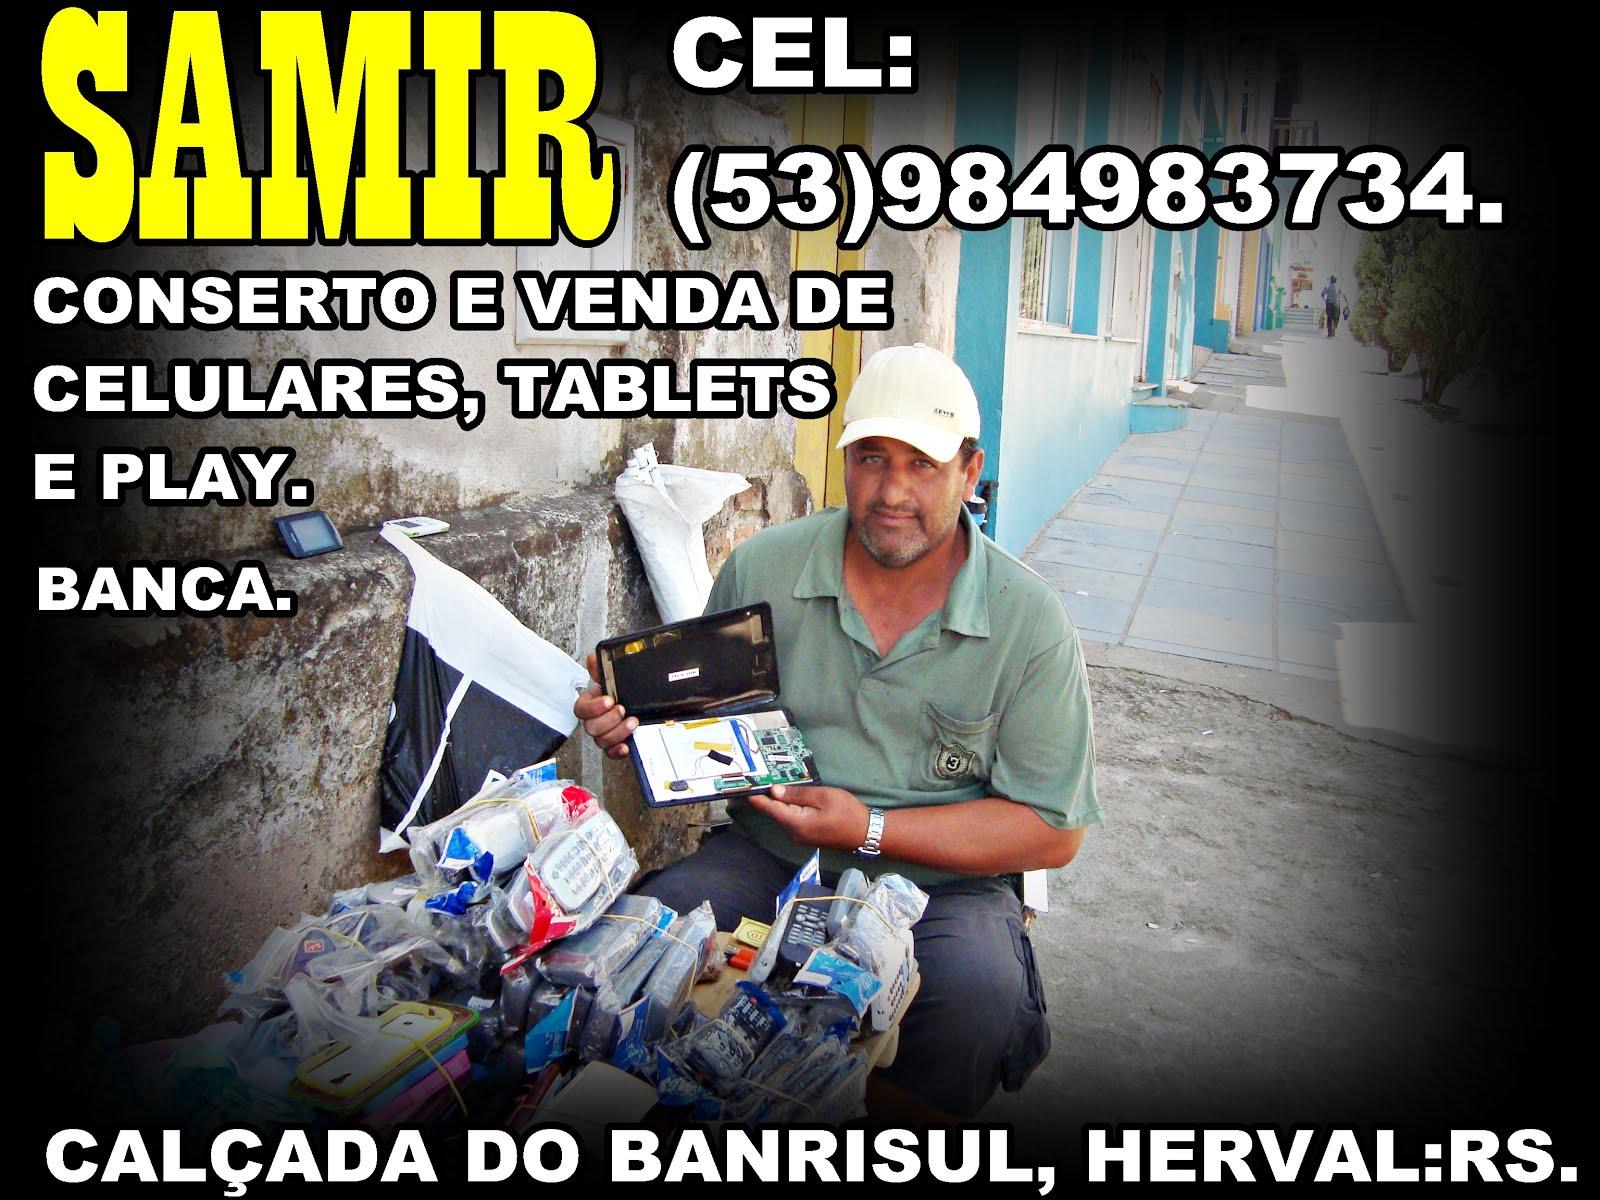 BANCA DO SAMIR